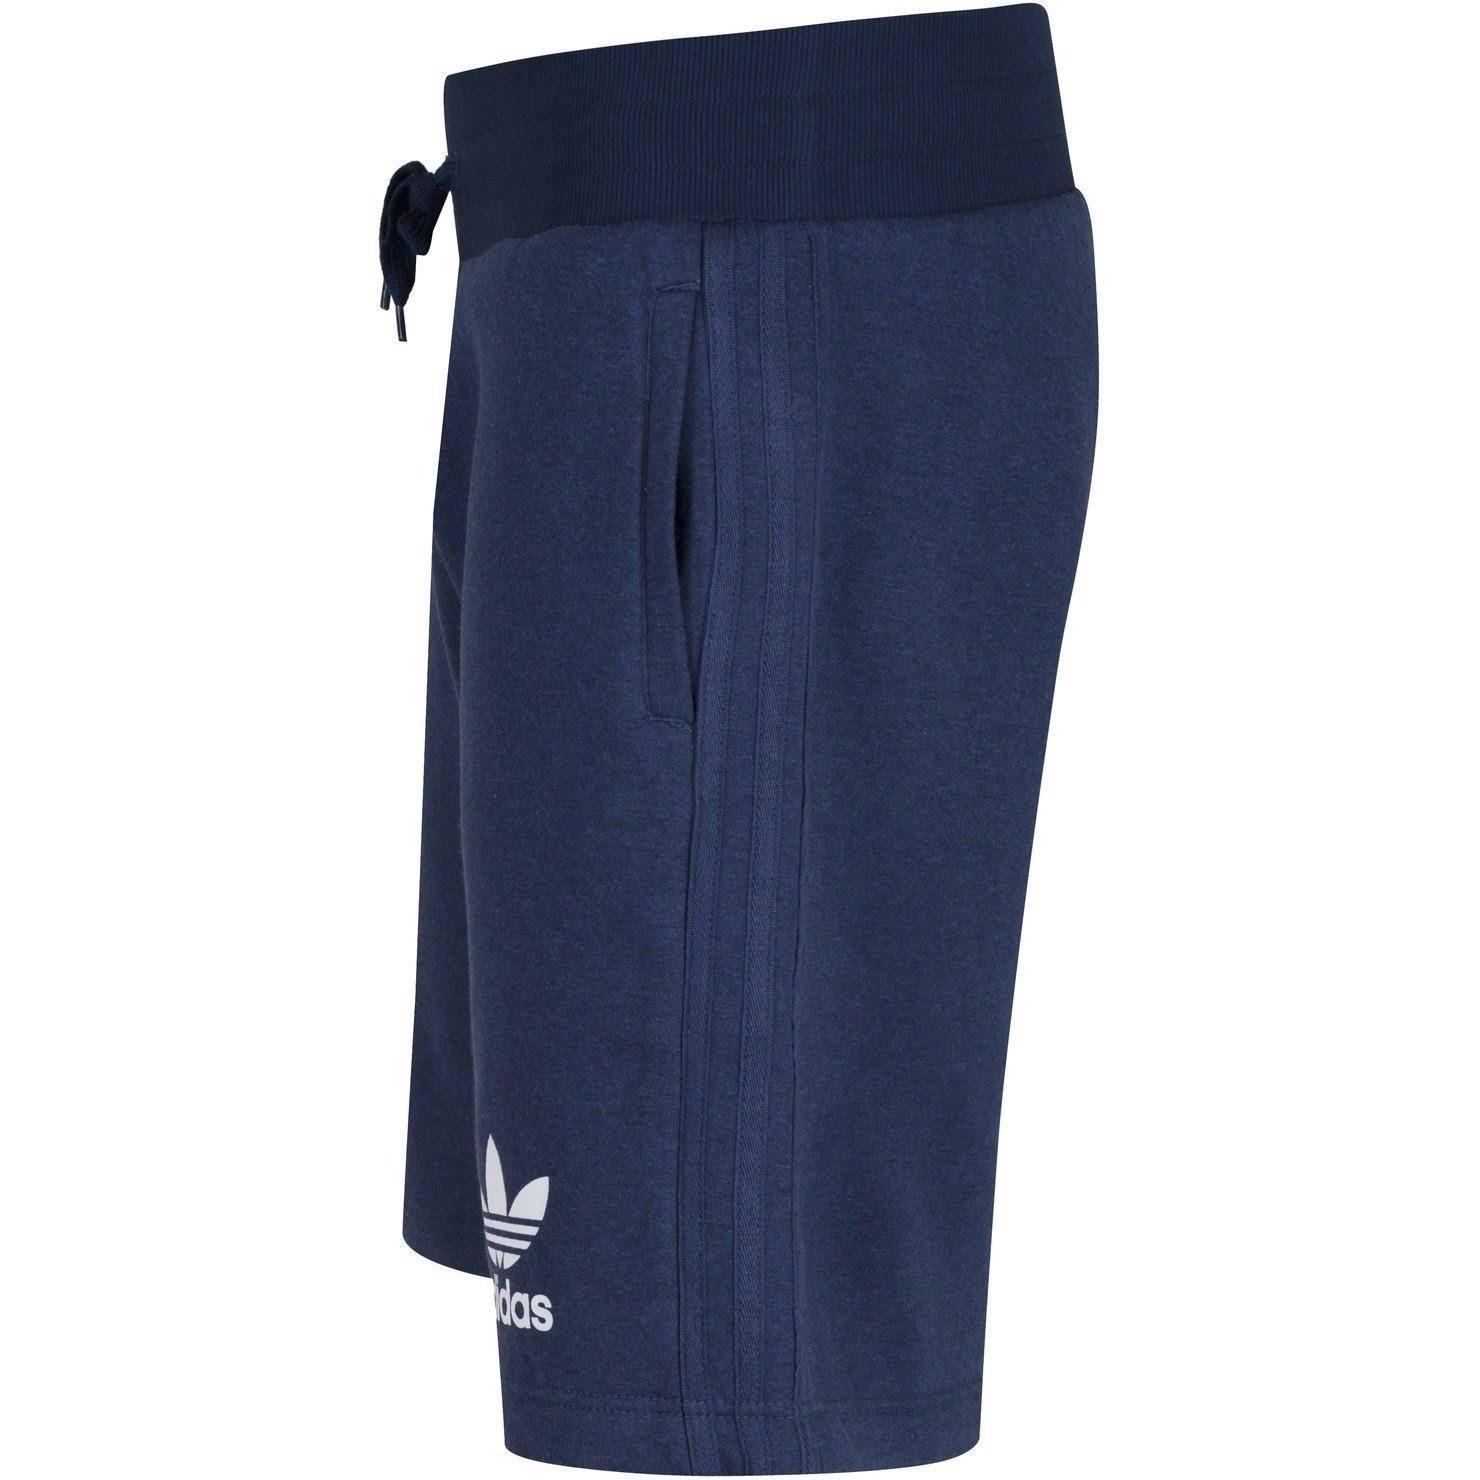 Adidas Originals Essential Sport Shorts - Navy